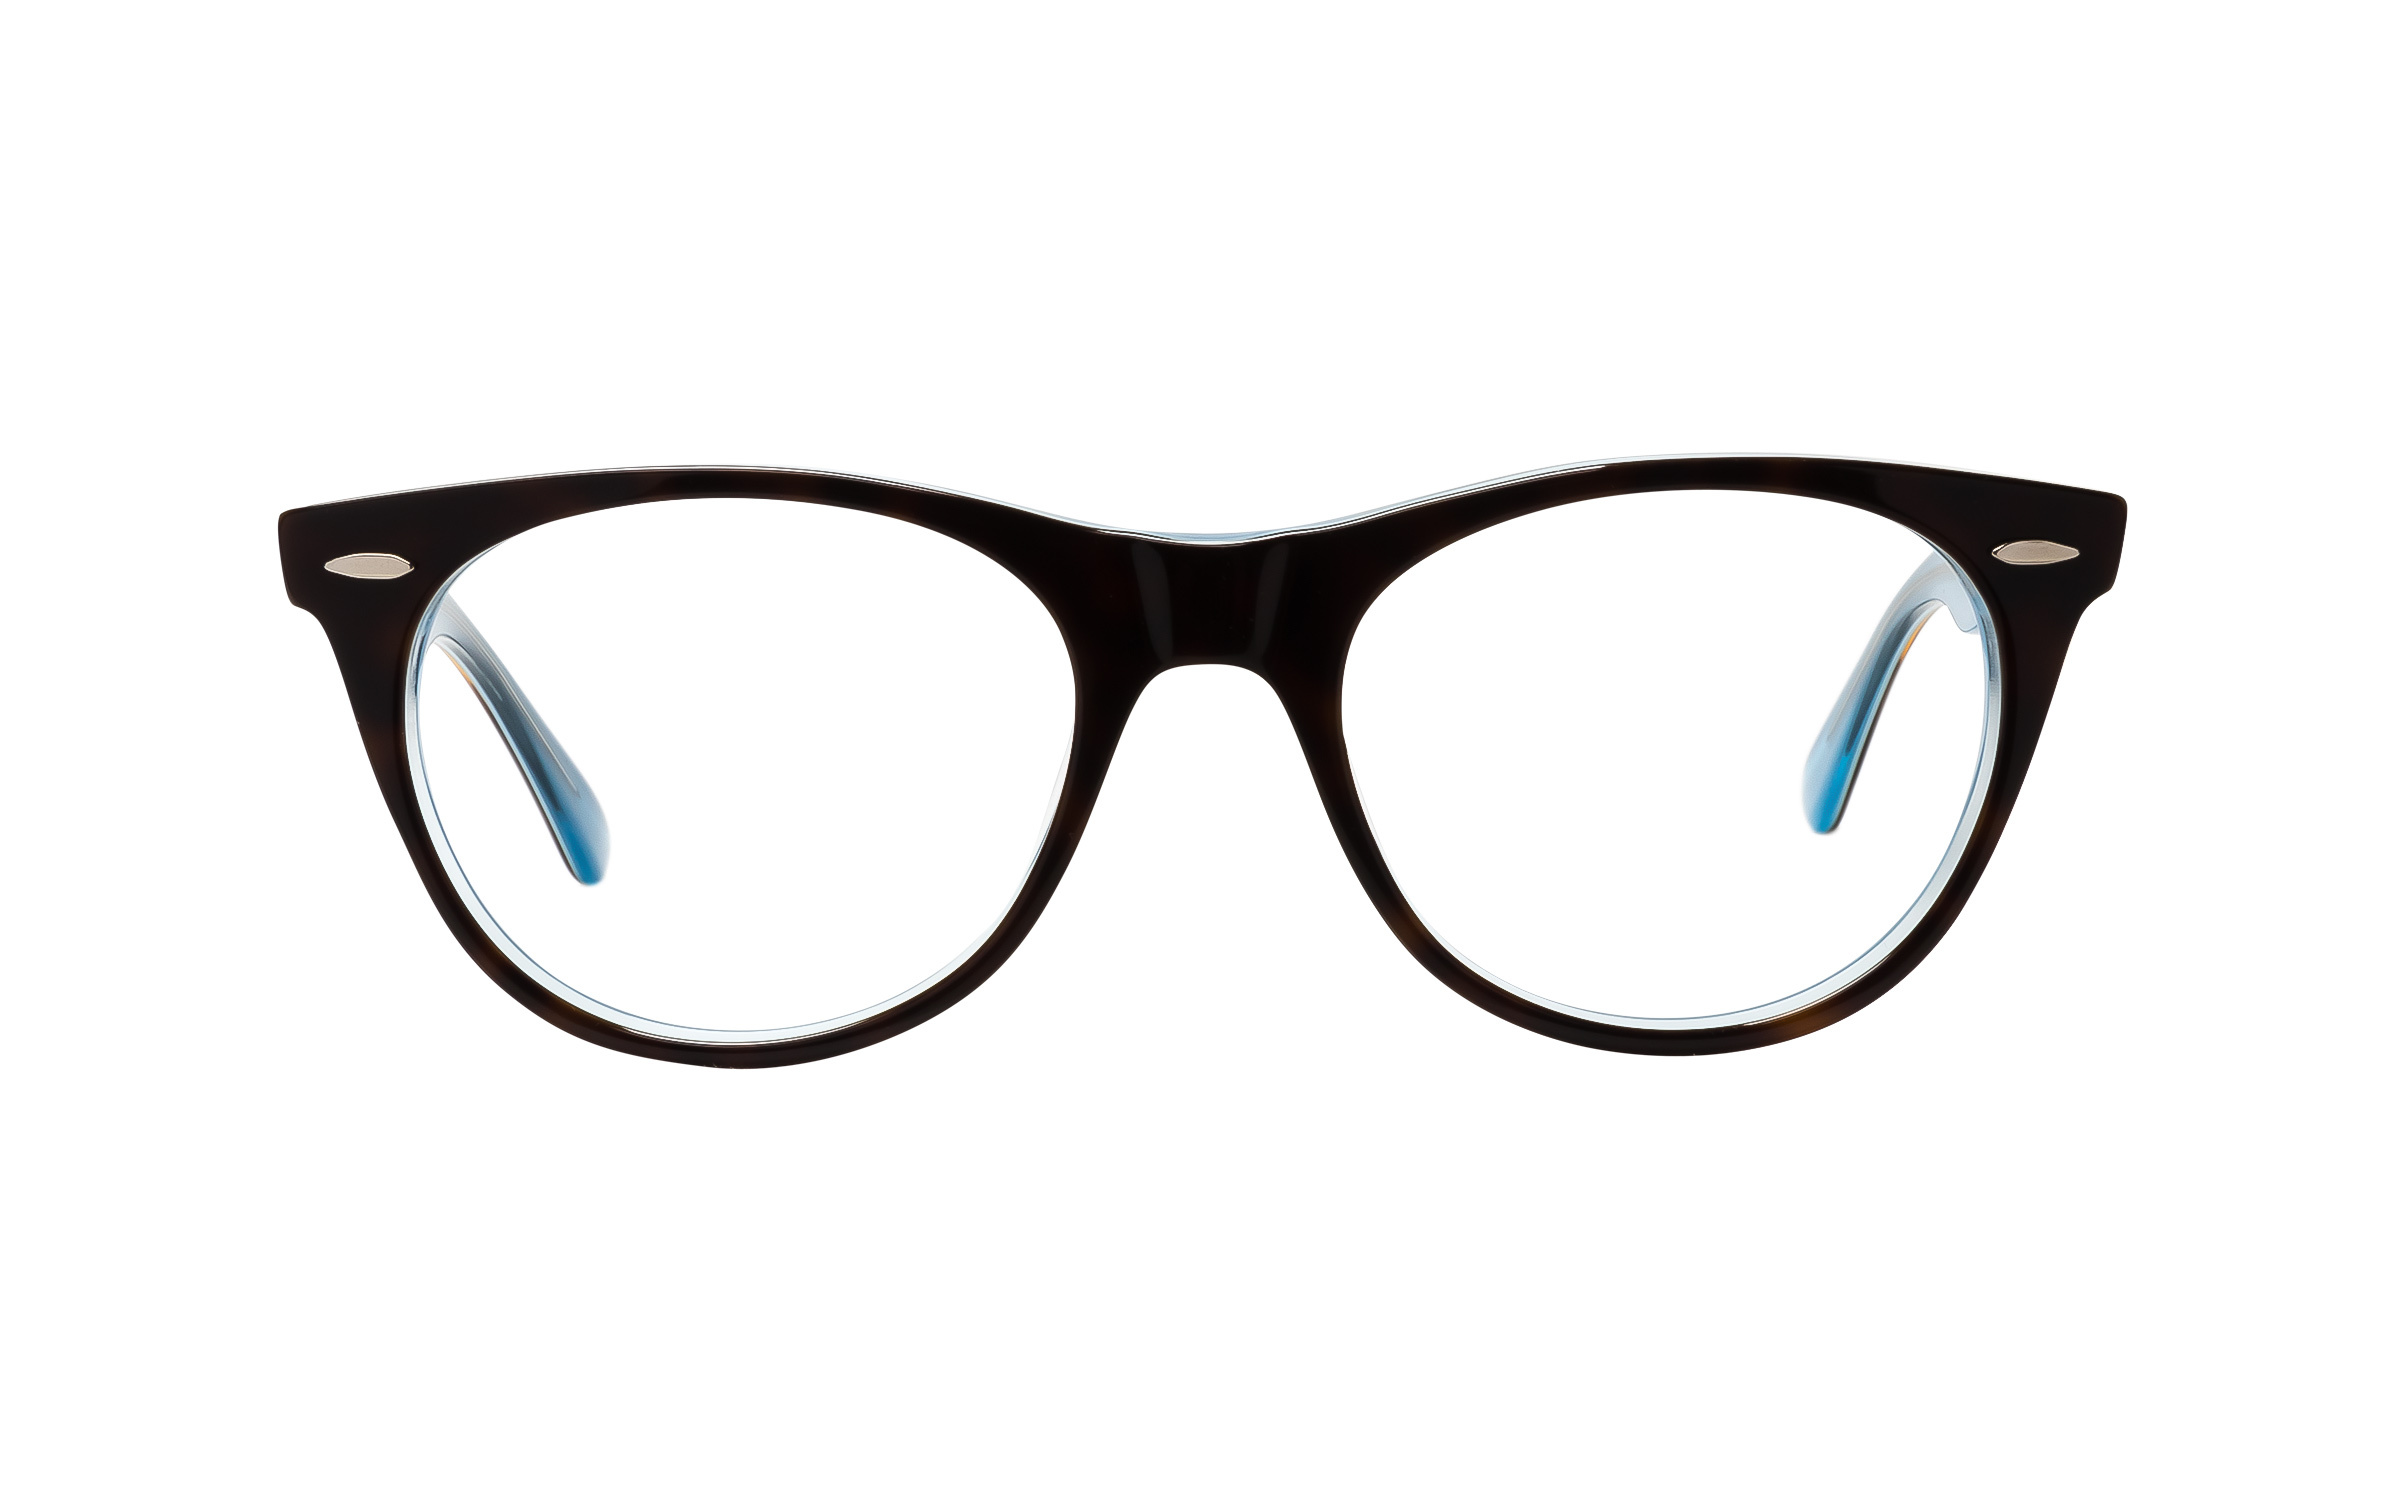 Ray-Ban Wayfarer Wayfarer II RX2185V 5883 (50) Eyeglasses and Frame in Brown/Tortoise | Acetate/Metal - Online Coastal